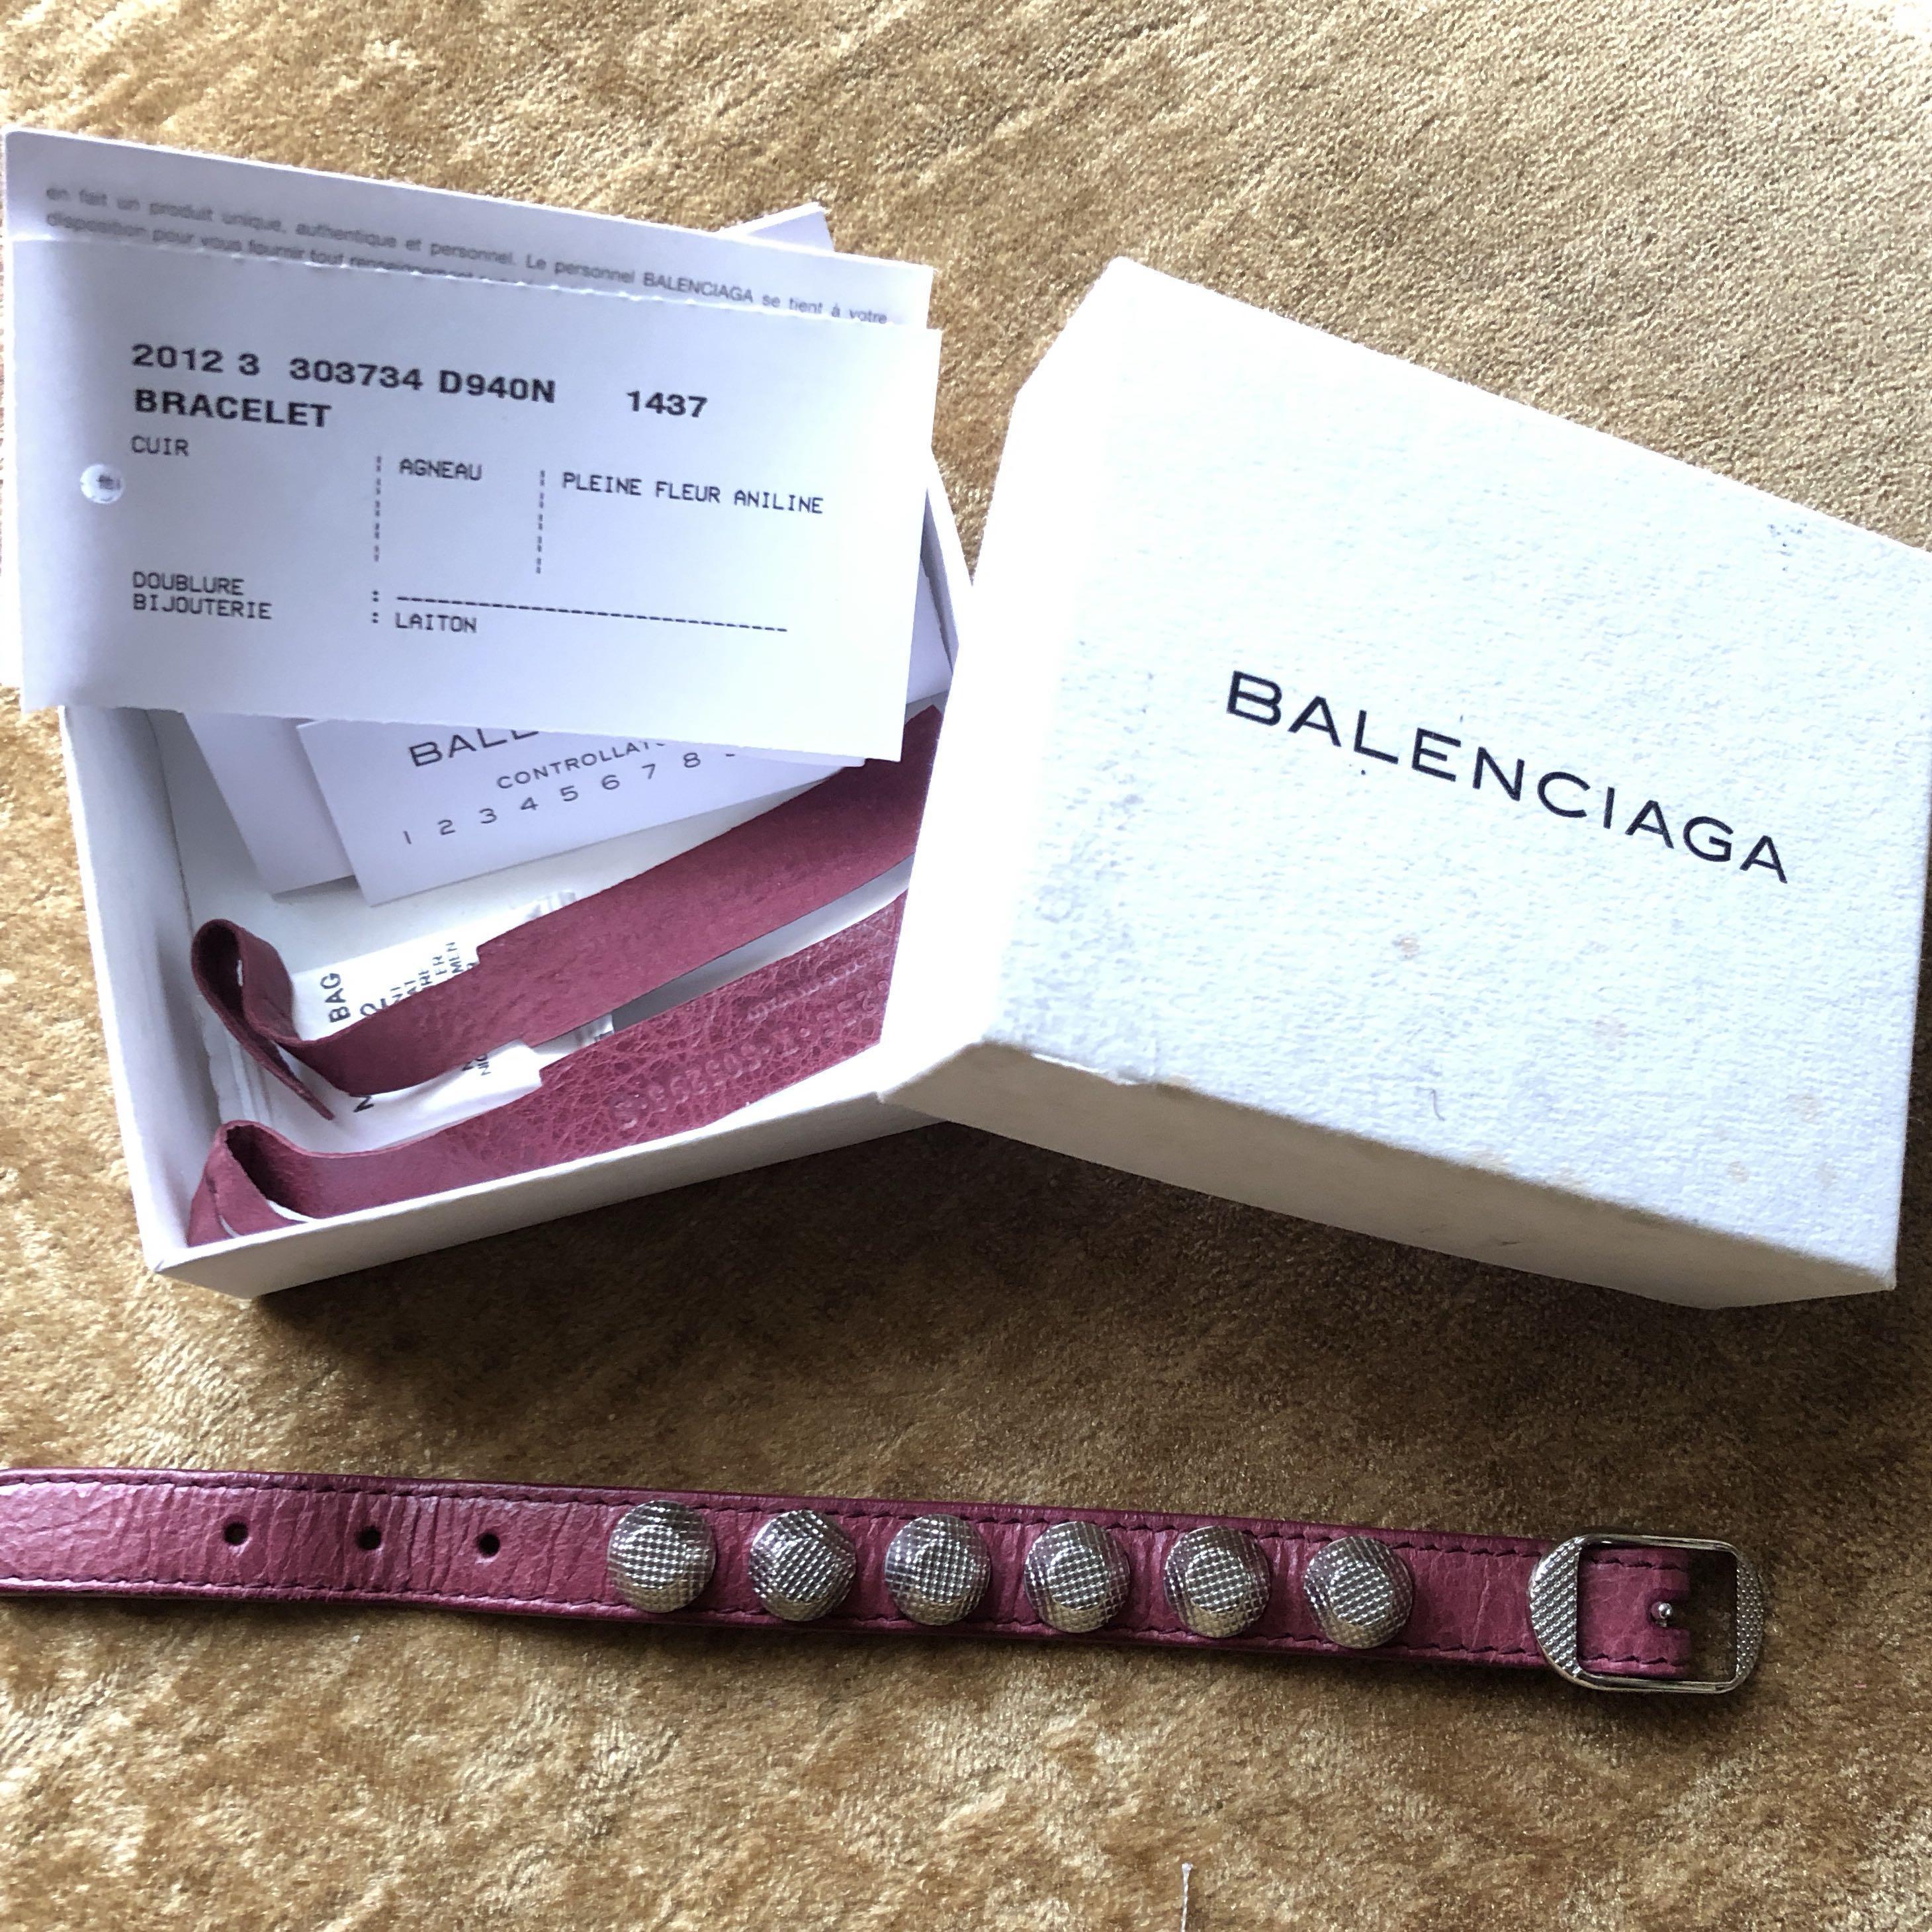 Balenciaga Bracelet AUTHENTIC in Purple